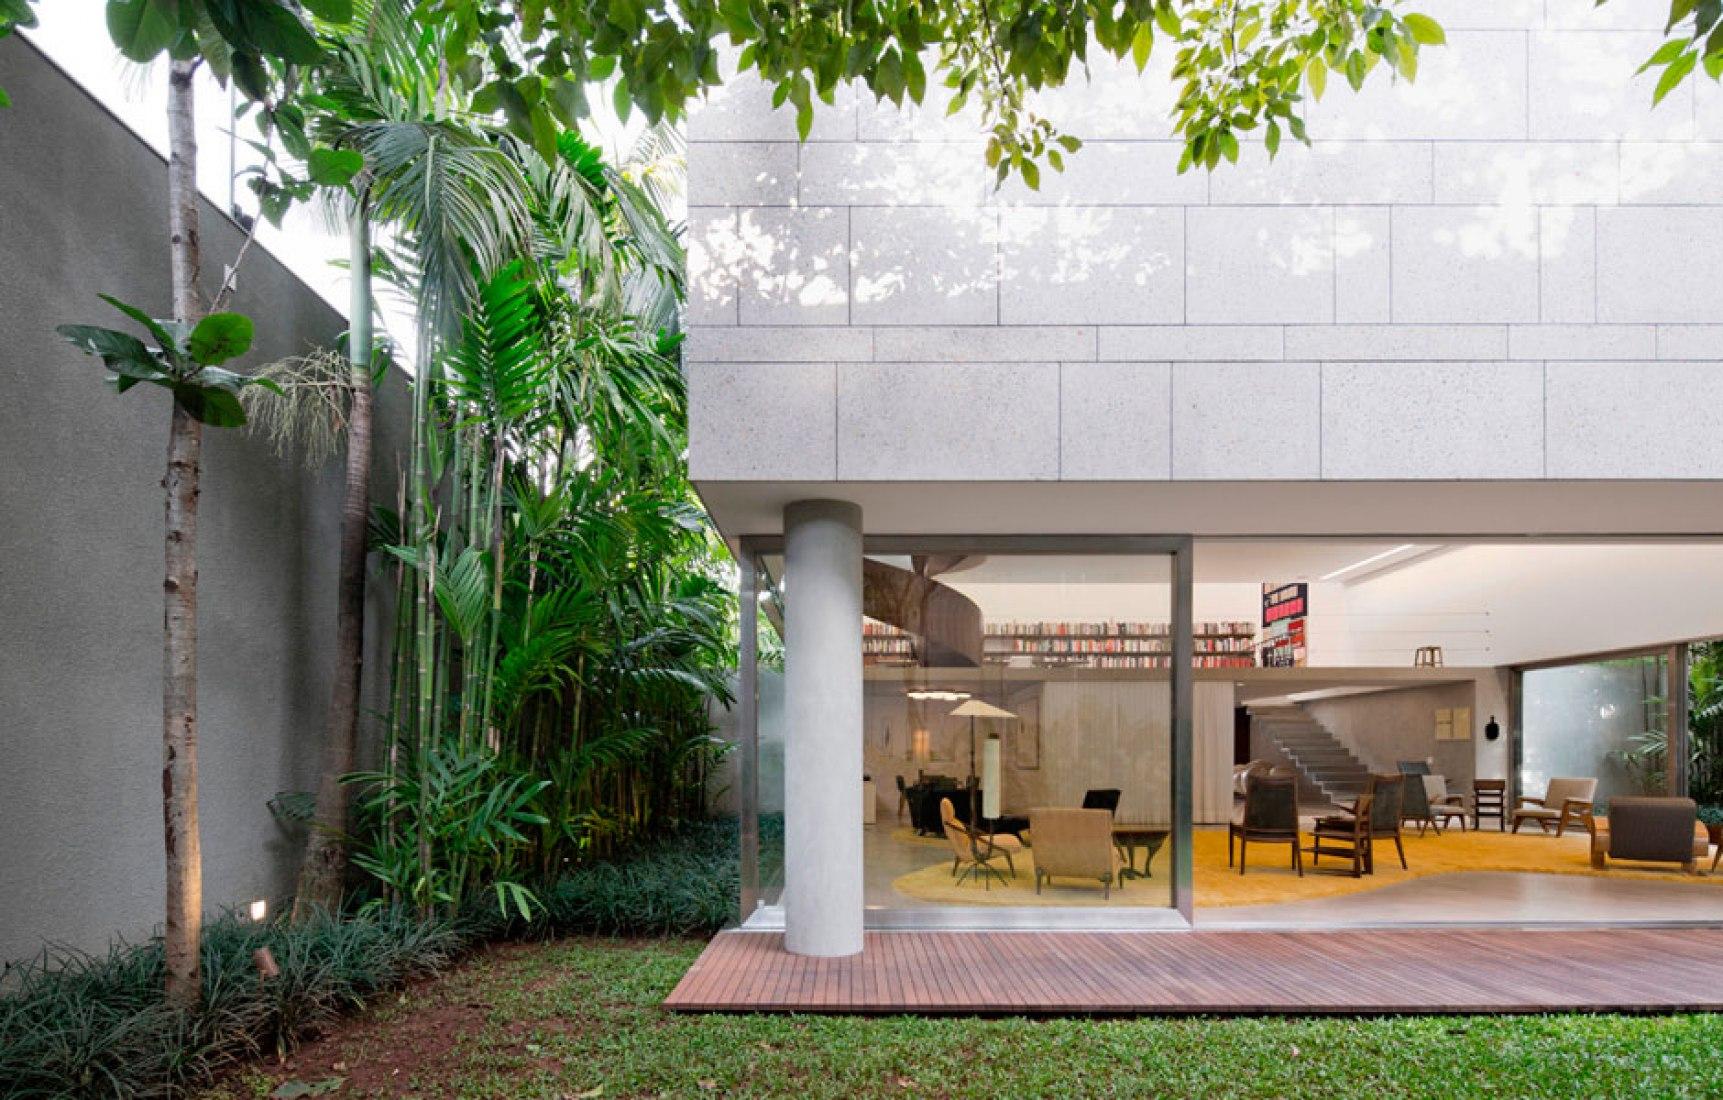 Vista exterior. Casa Cubo, Sao Pablo, Brasil de Isay Weinfeld. Fotografía © Fernando Guerra.